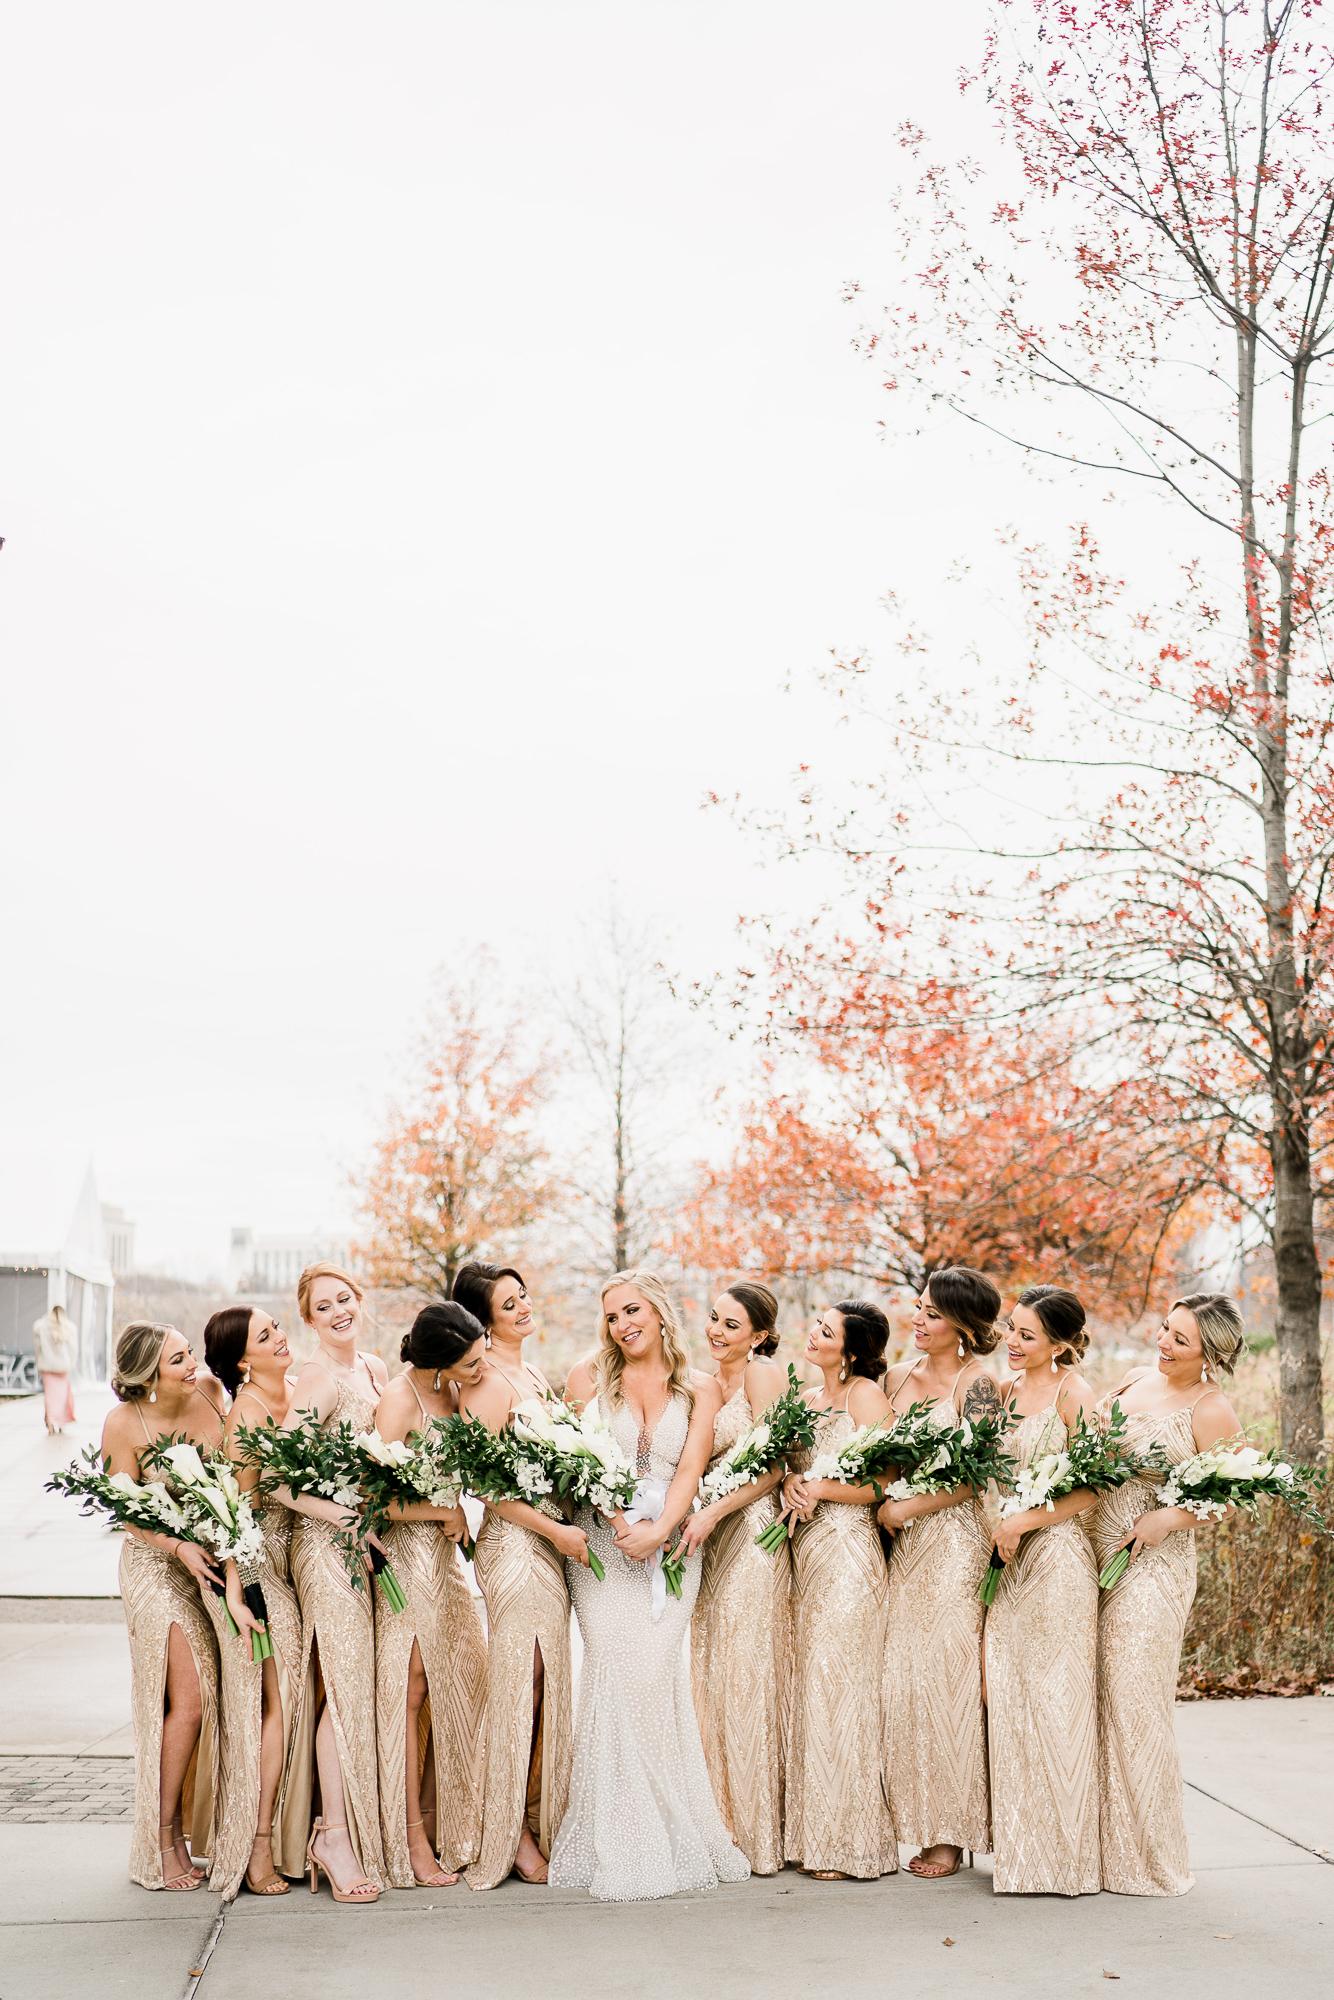 Sparkly Gold Bridesmaid Dresses   Nashville Bride Guide